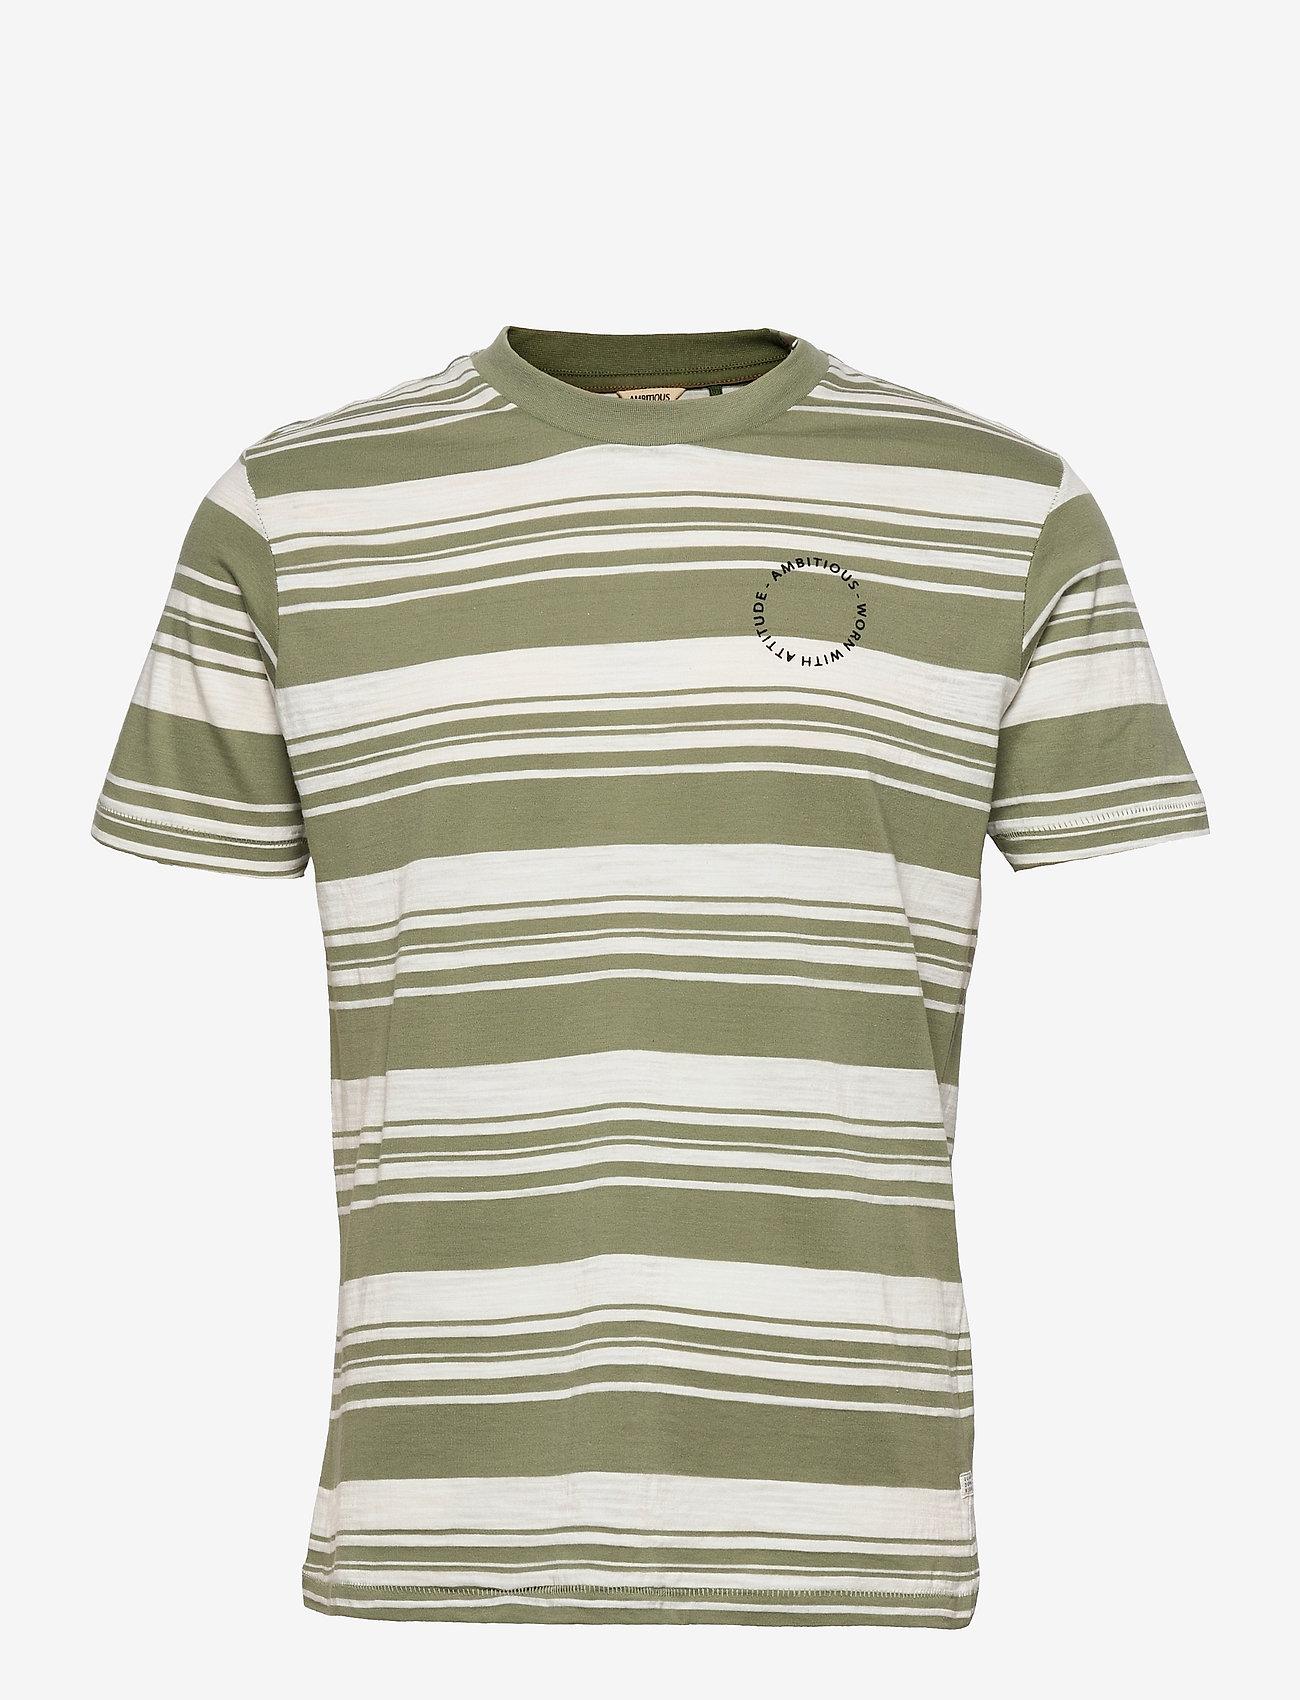 Blend - Tee Ambitious Regular fit - t-shirts à manches courtes - oil green - 0